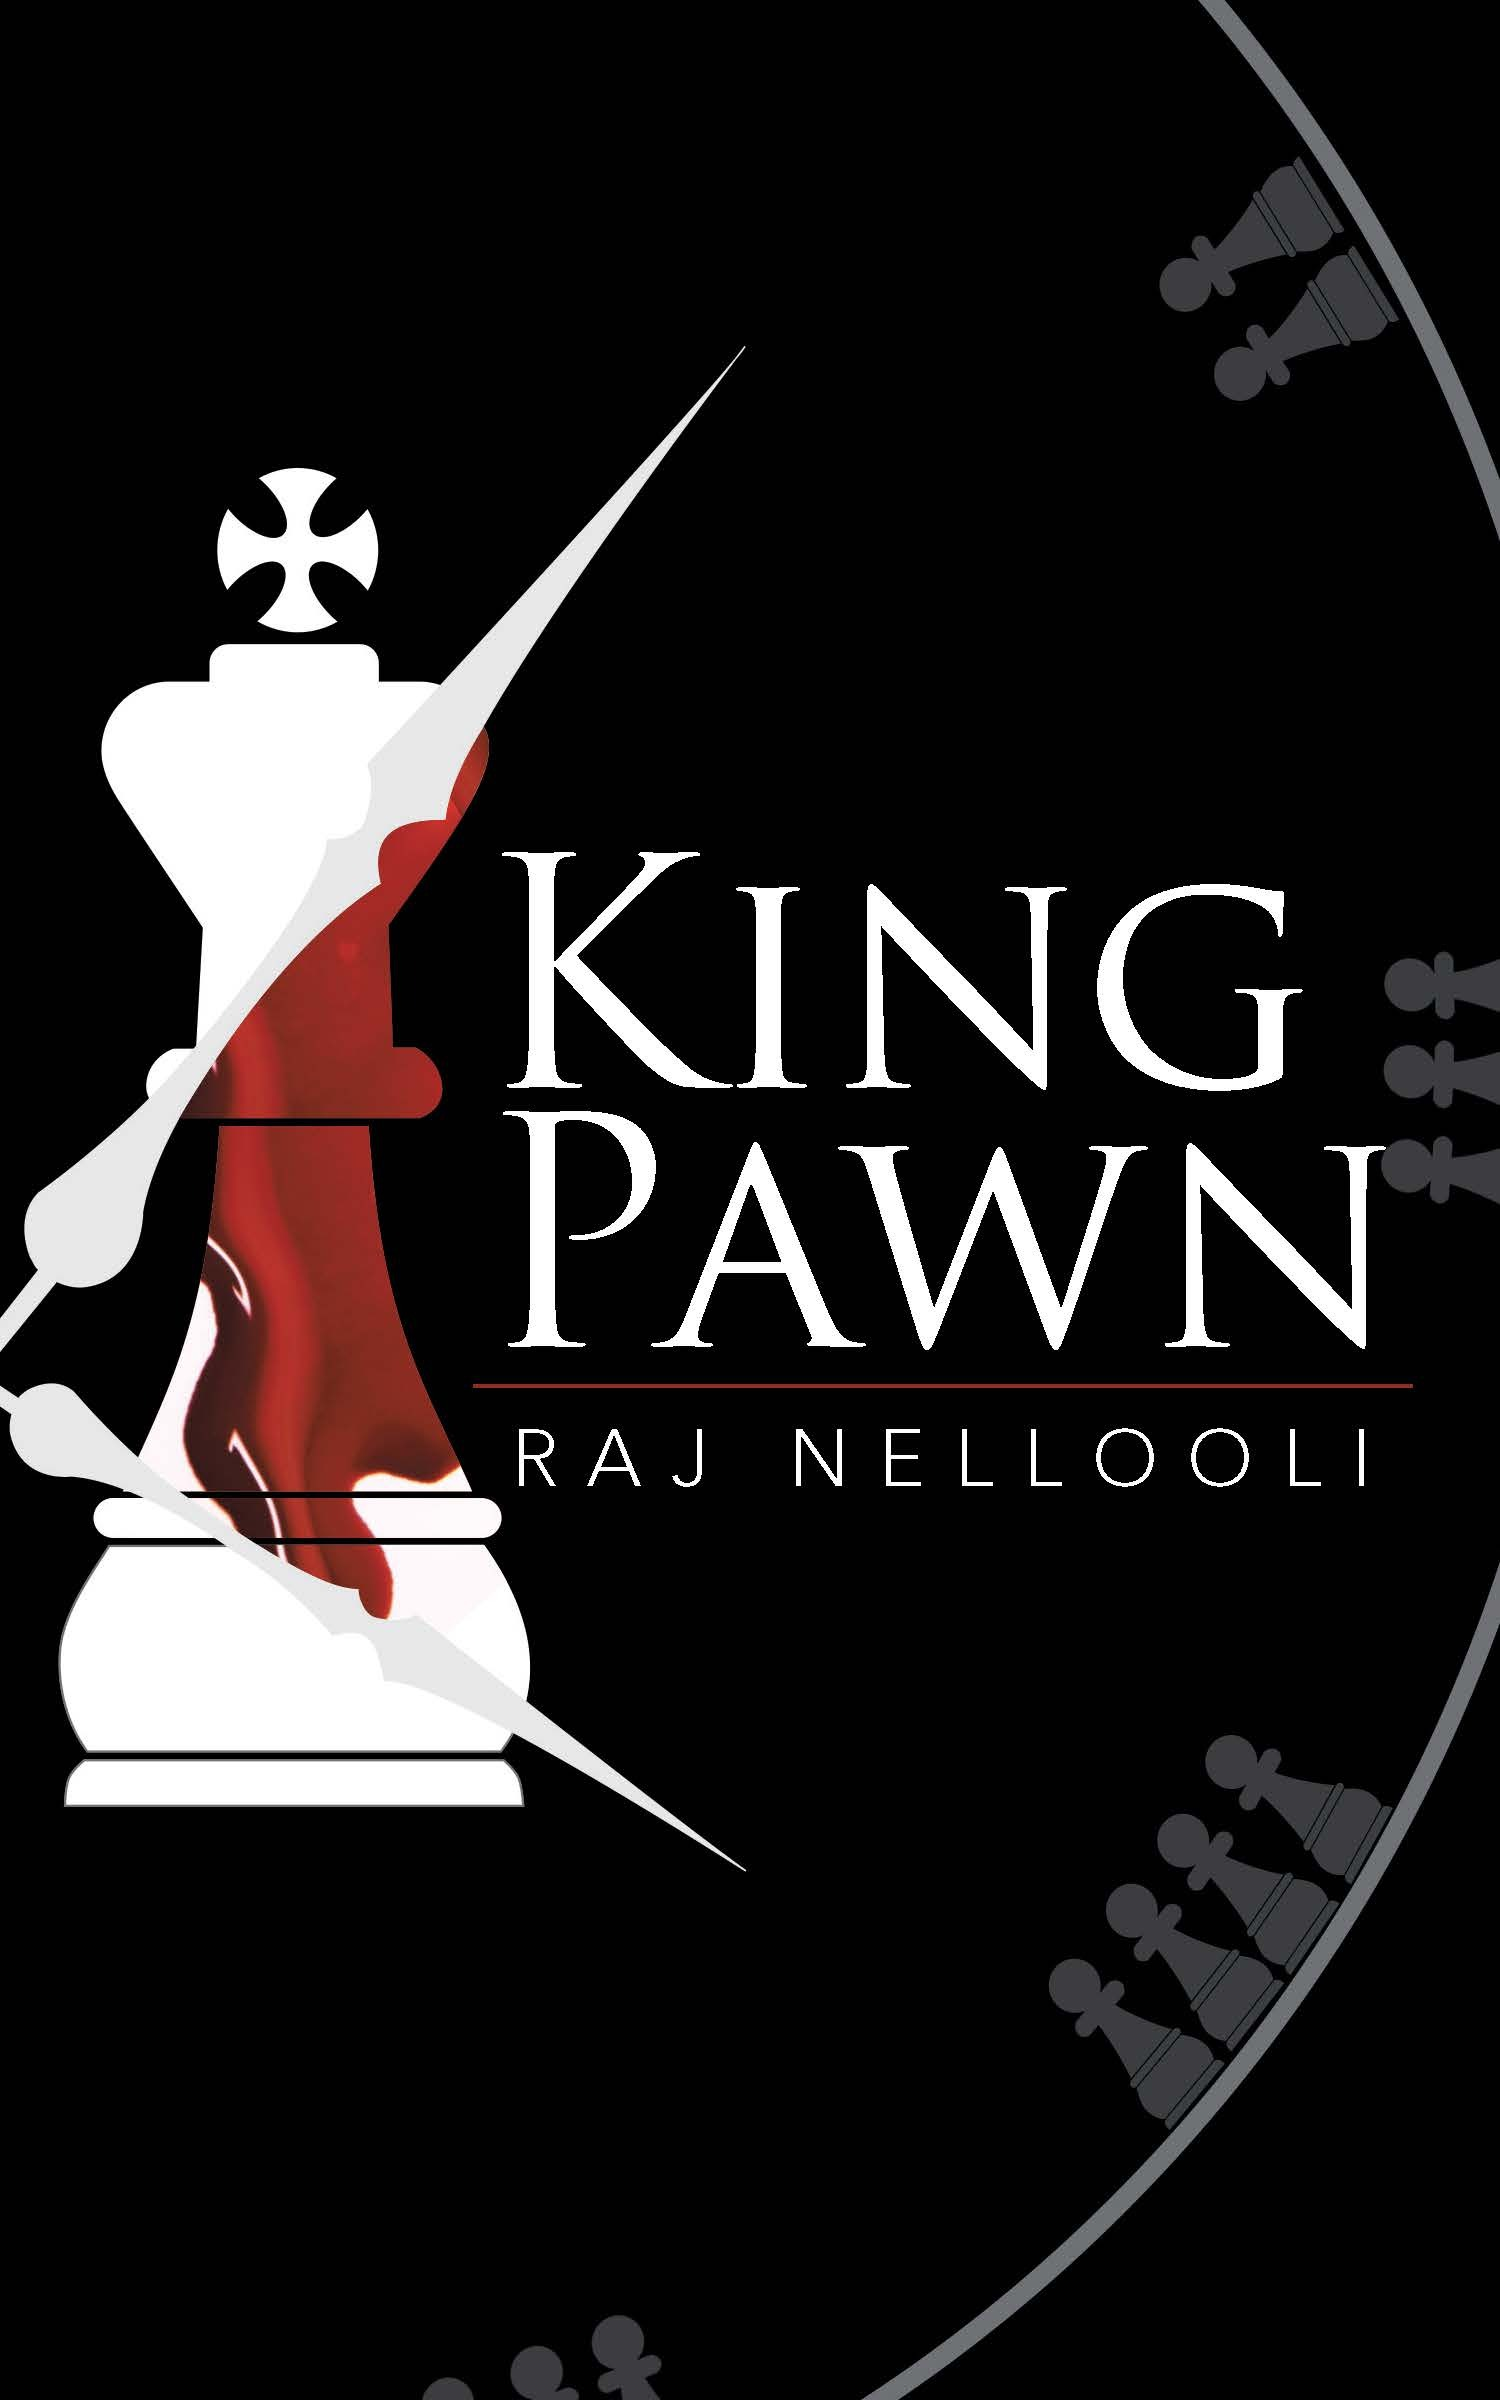 King Pawn  by  Raj Nellooli